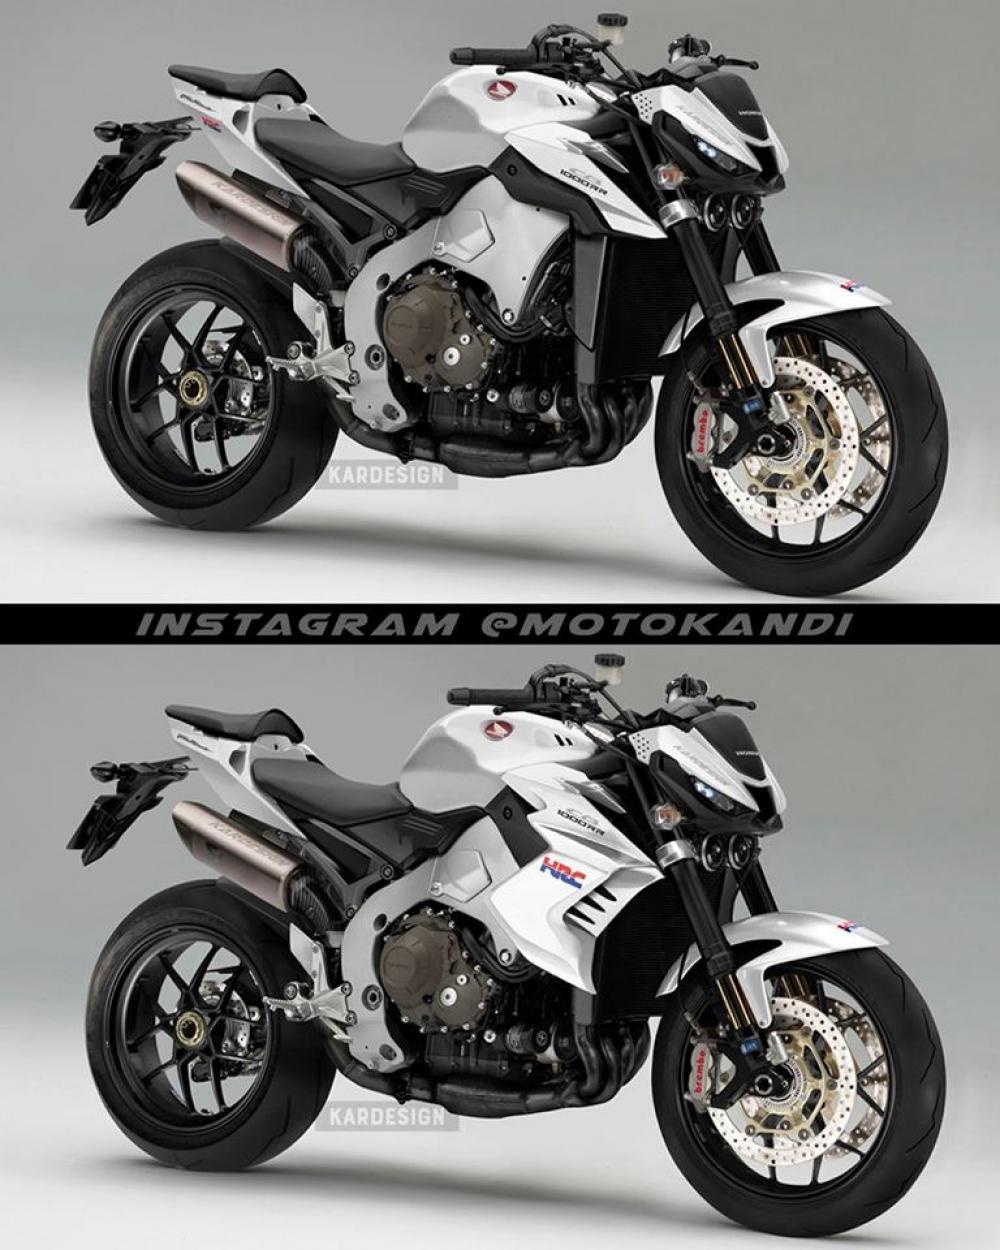 Vendo Honda CB 1000 R Neo Sport Cafè (2018 - 20) nuova a